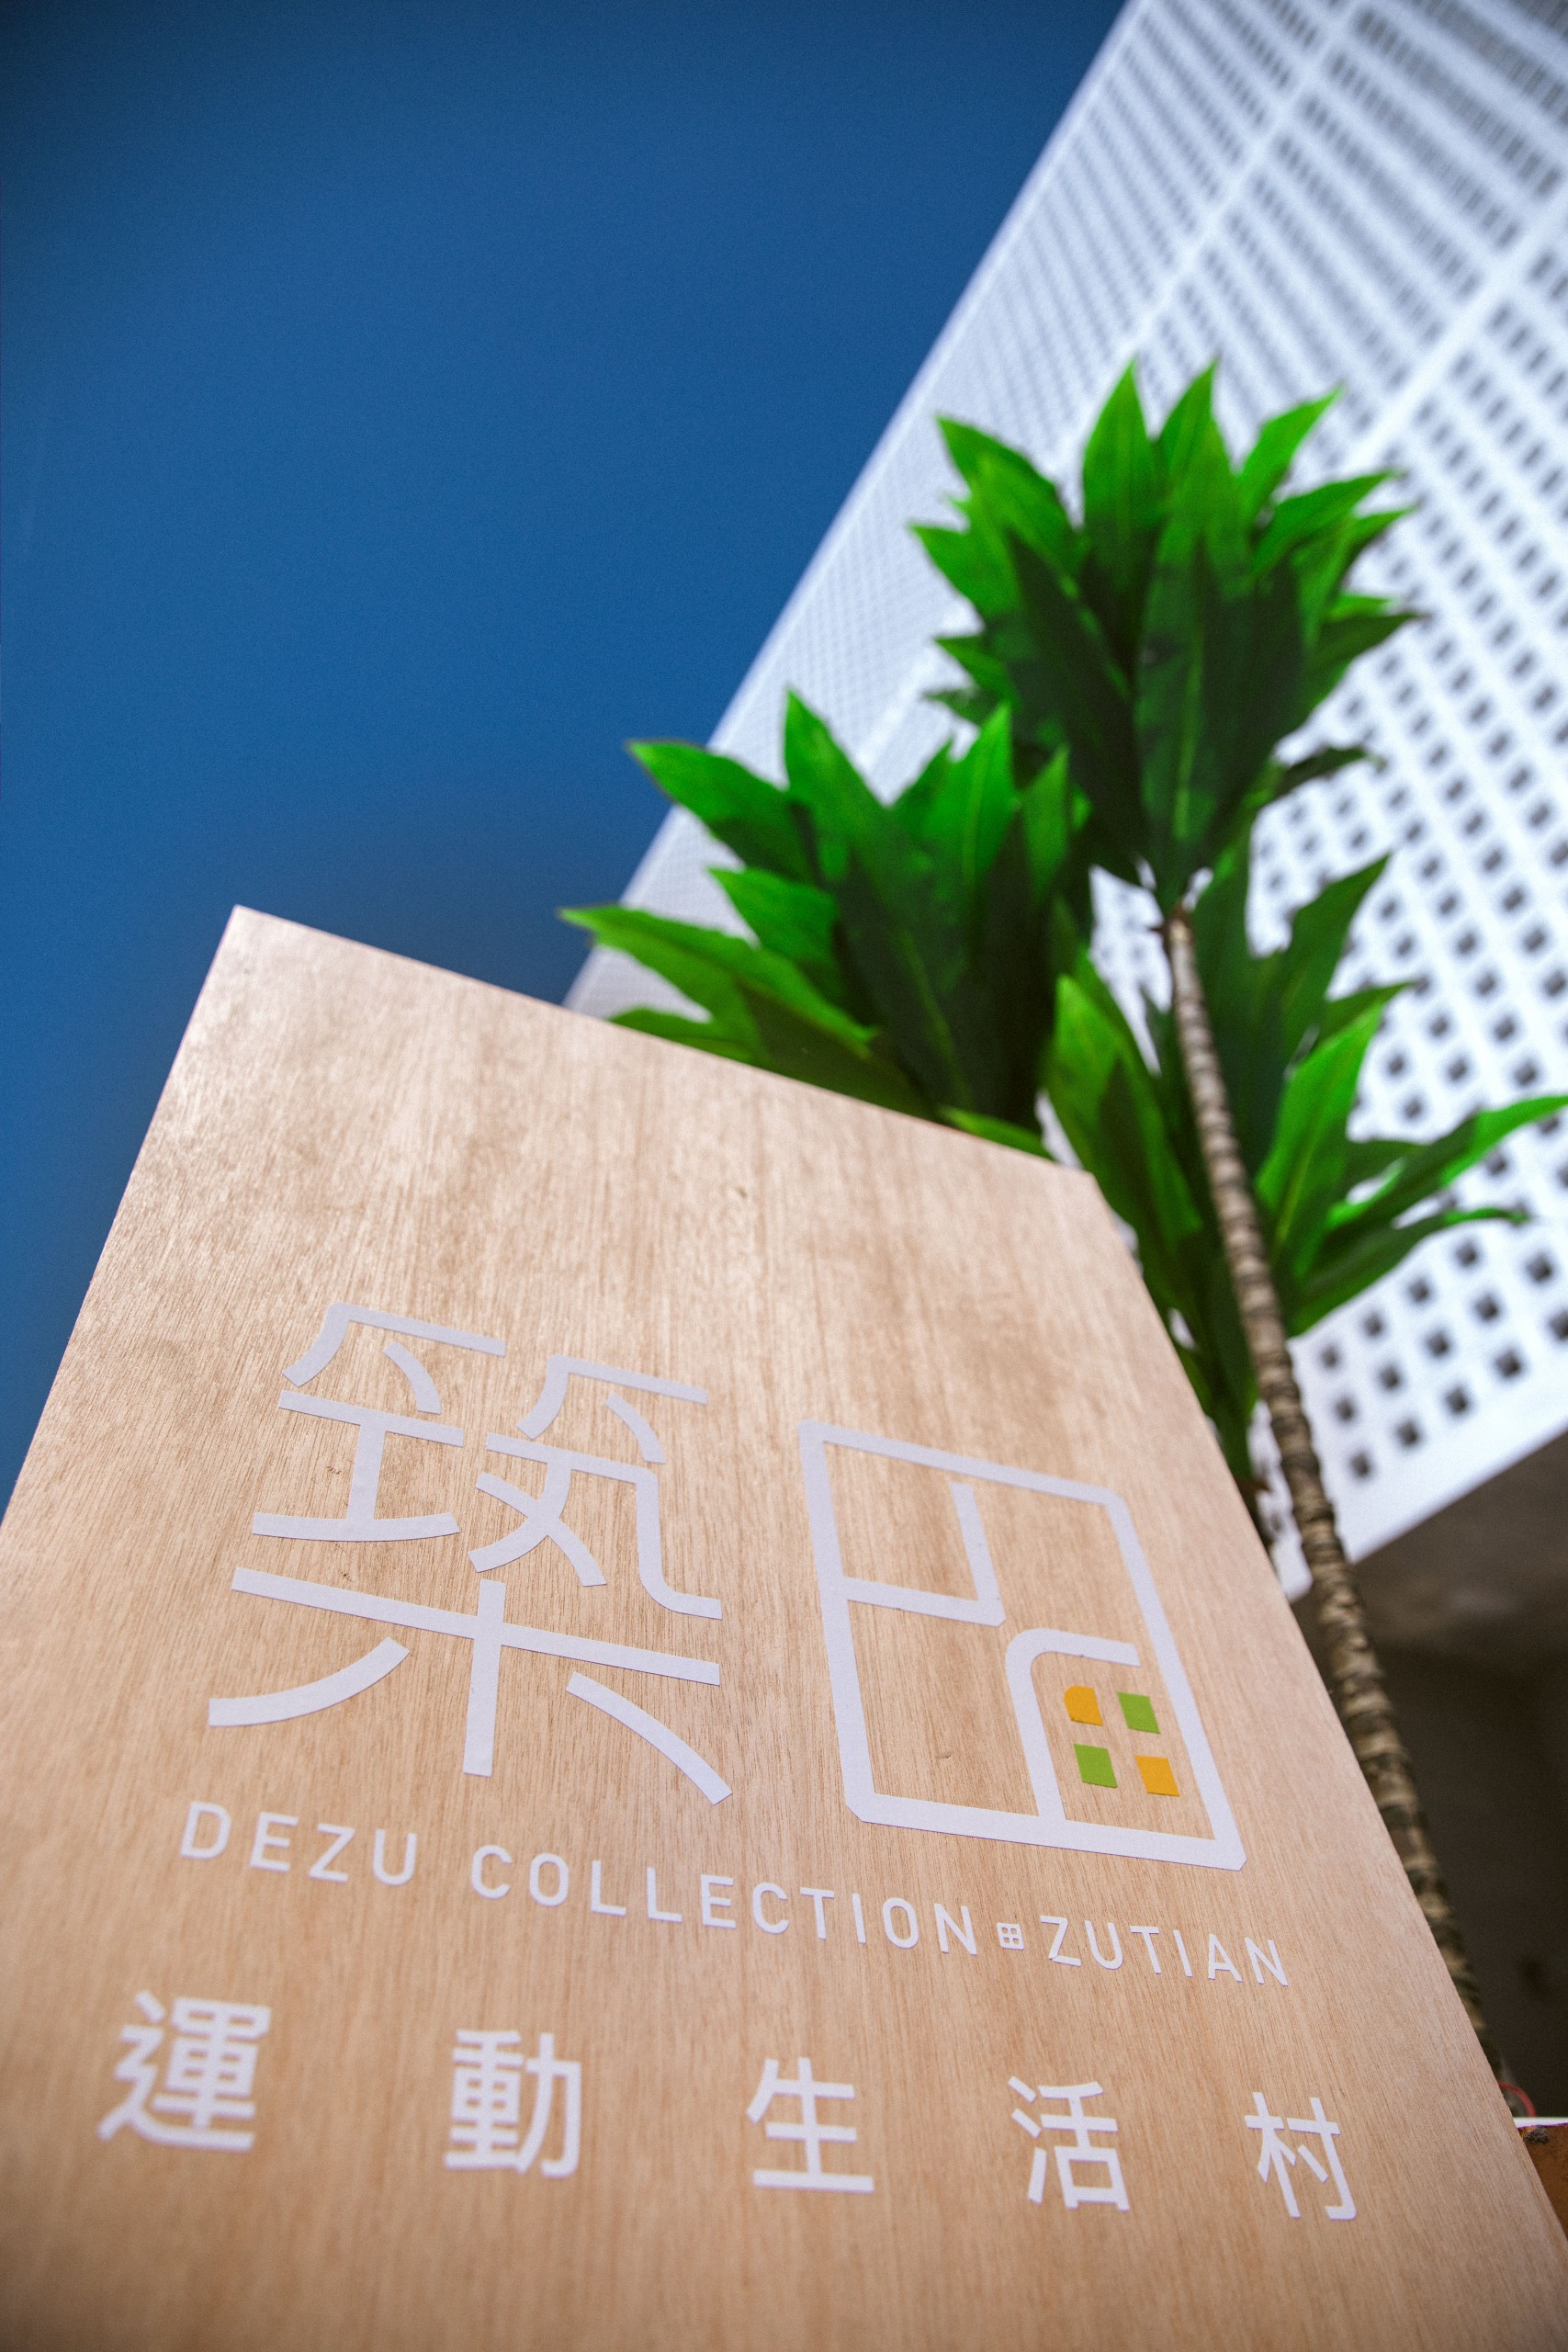 德築-DEZU-project-Zutian-activity-planting-party-6